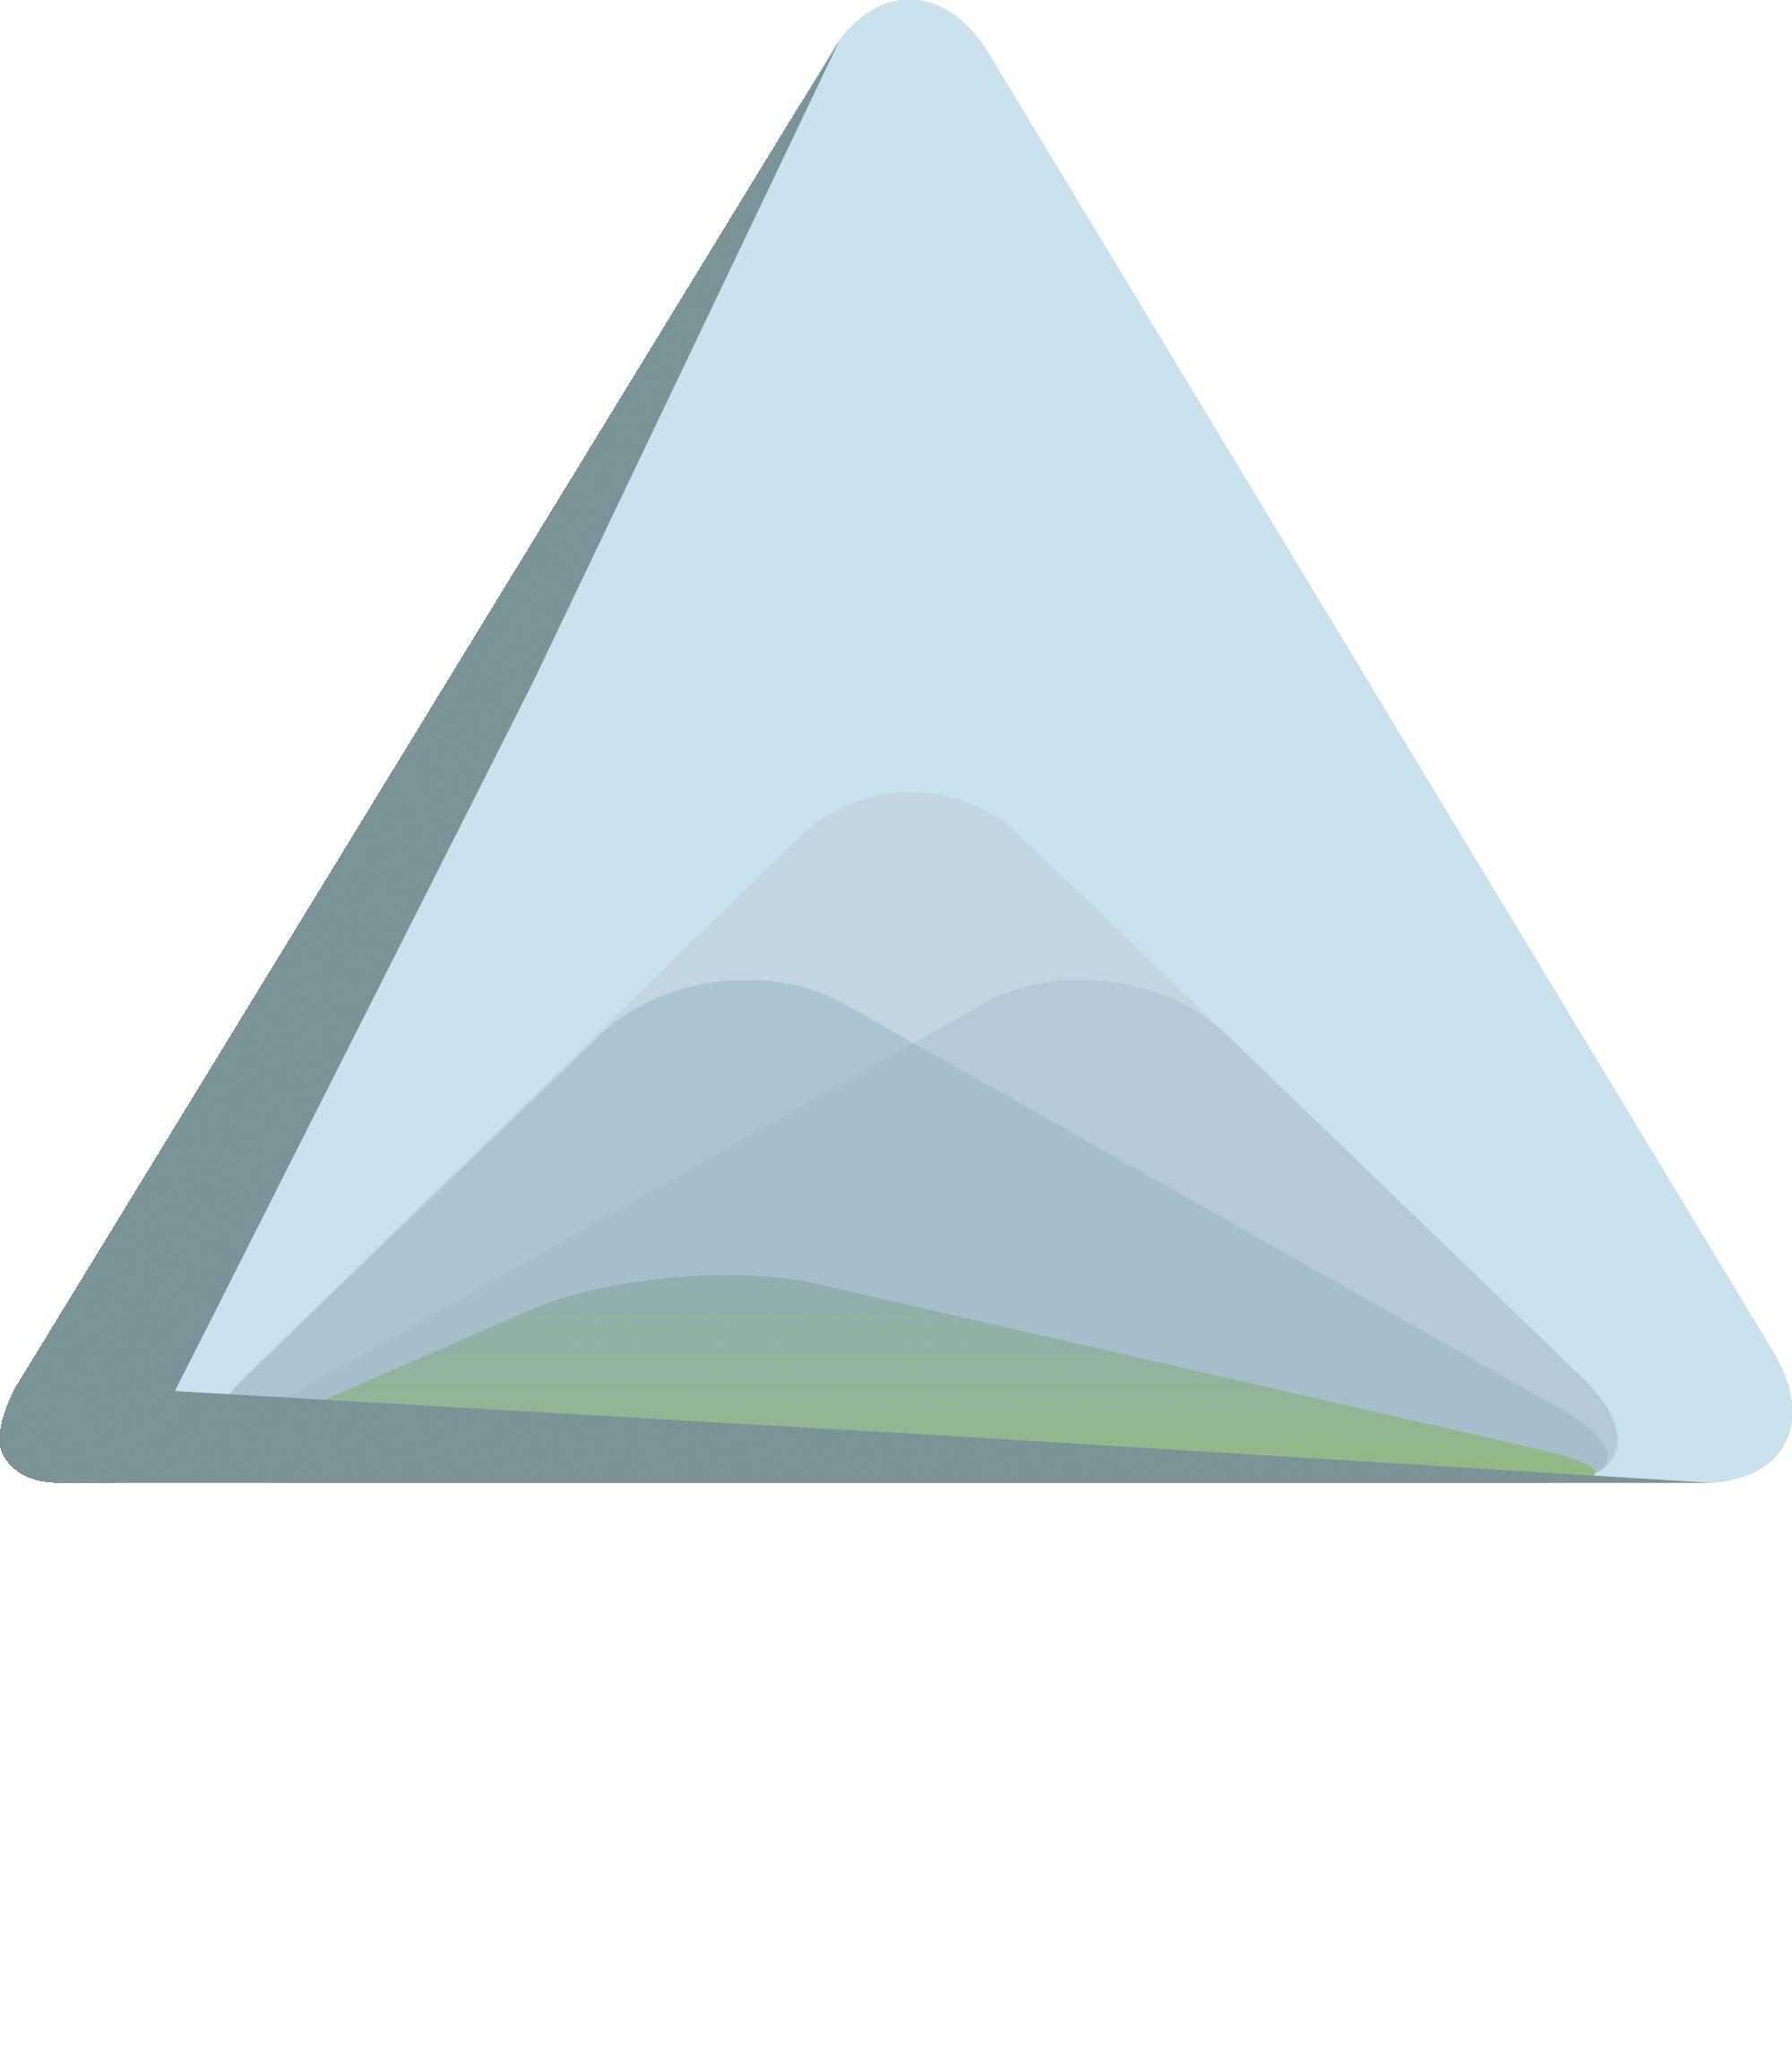 Lasse Abraham